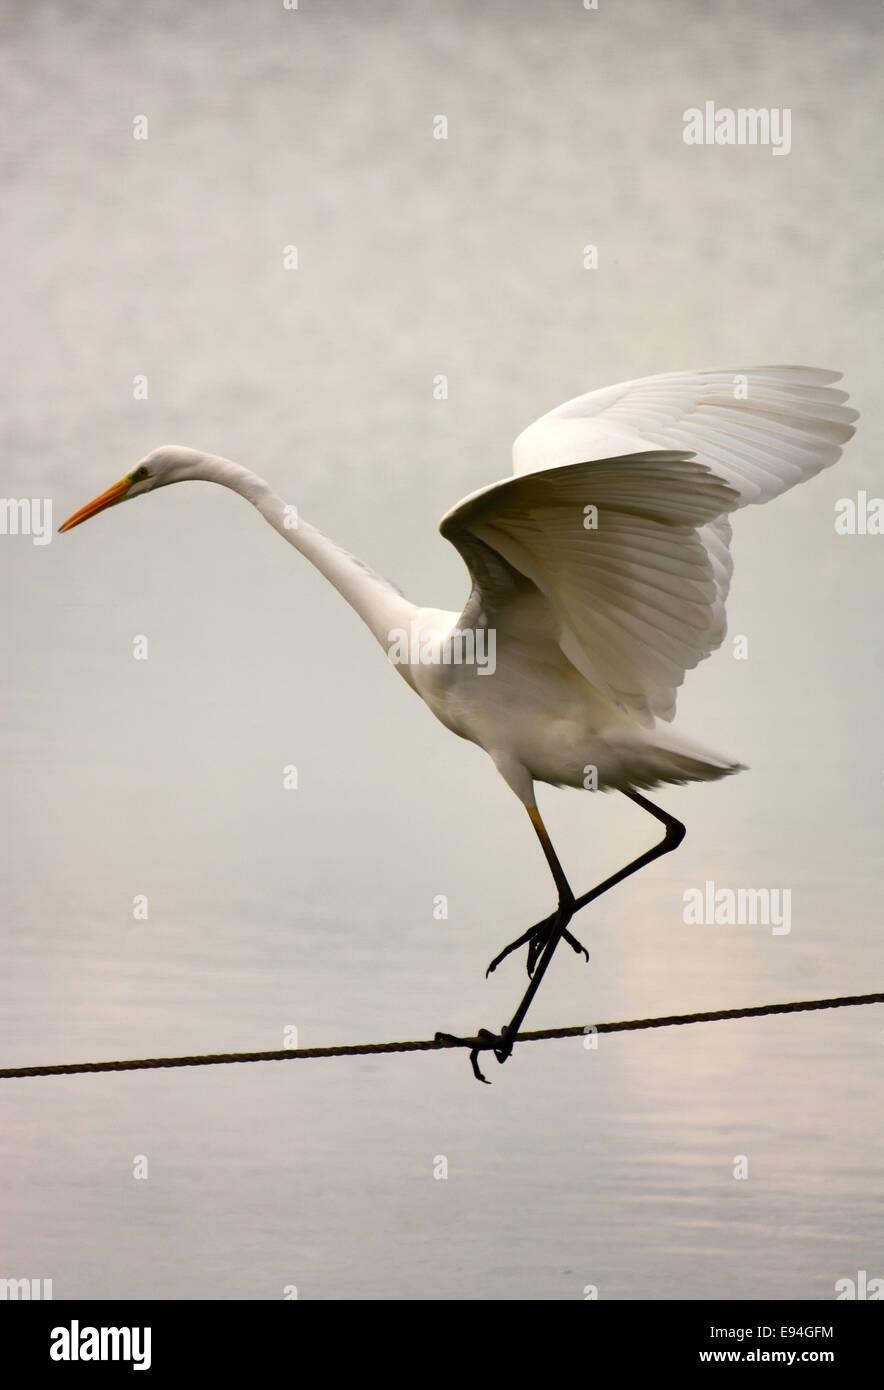 Great Egret, Ardea alba, Balance on cable - Stock Image